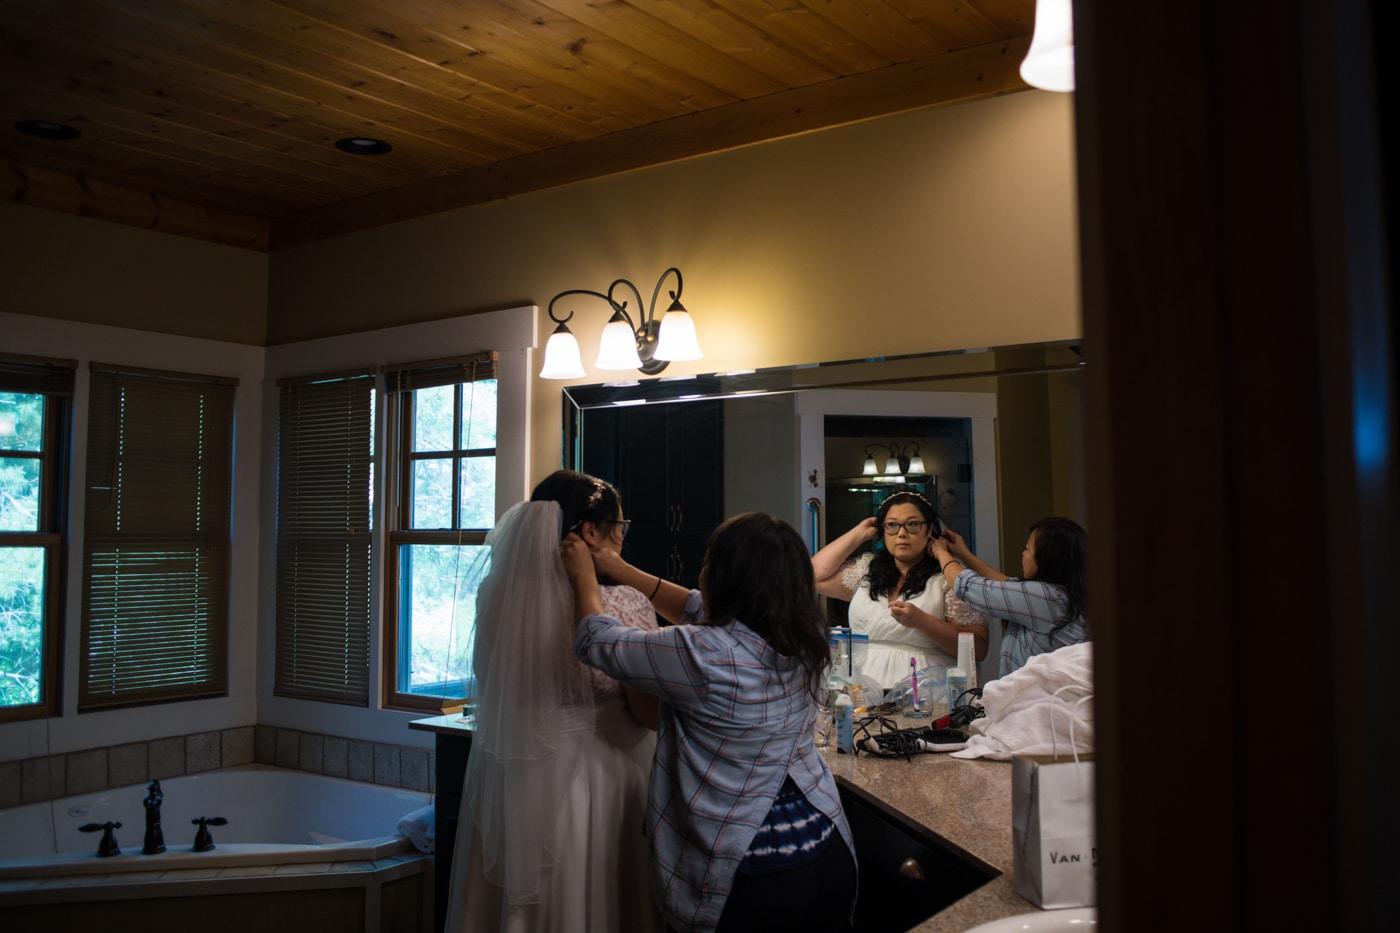 mom helps bride with veil before Lake Blue Ridge wedding ceremony